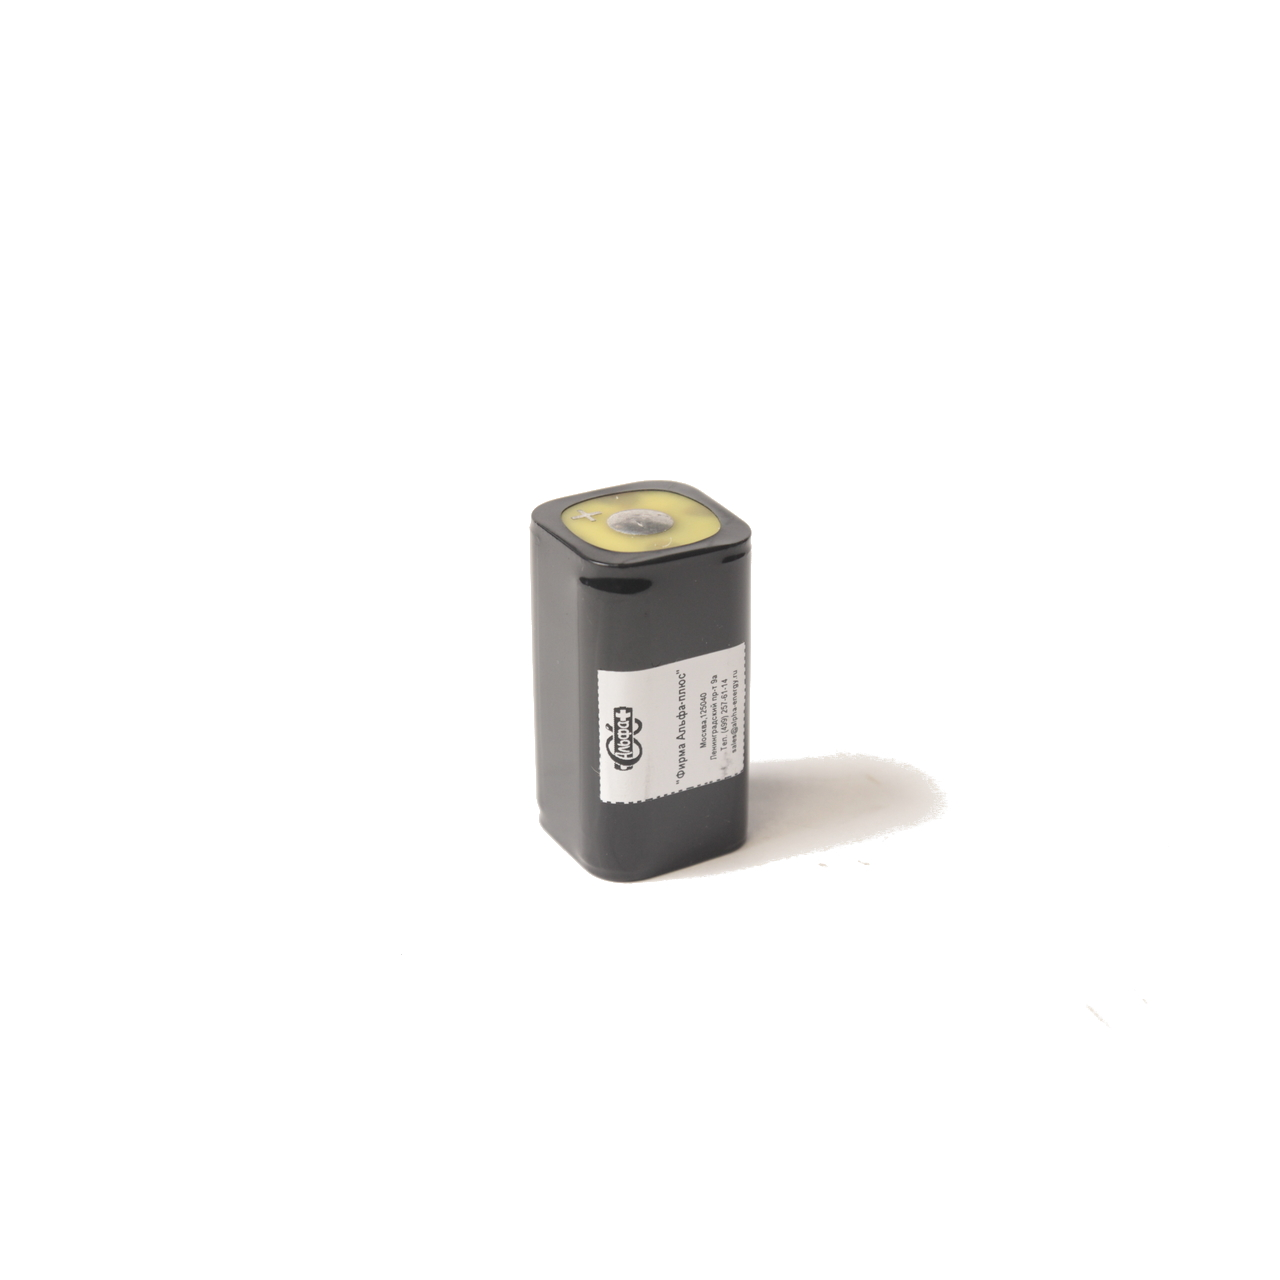 Батарея акк.3HR15/51-2.1/C-Y2